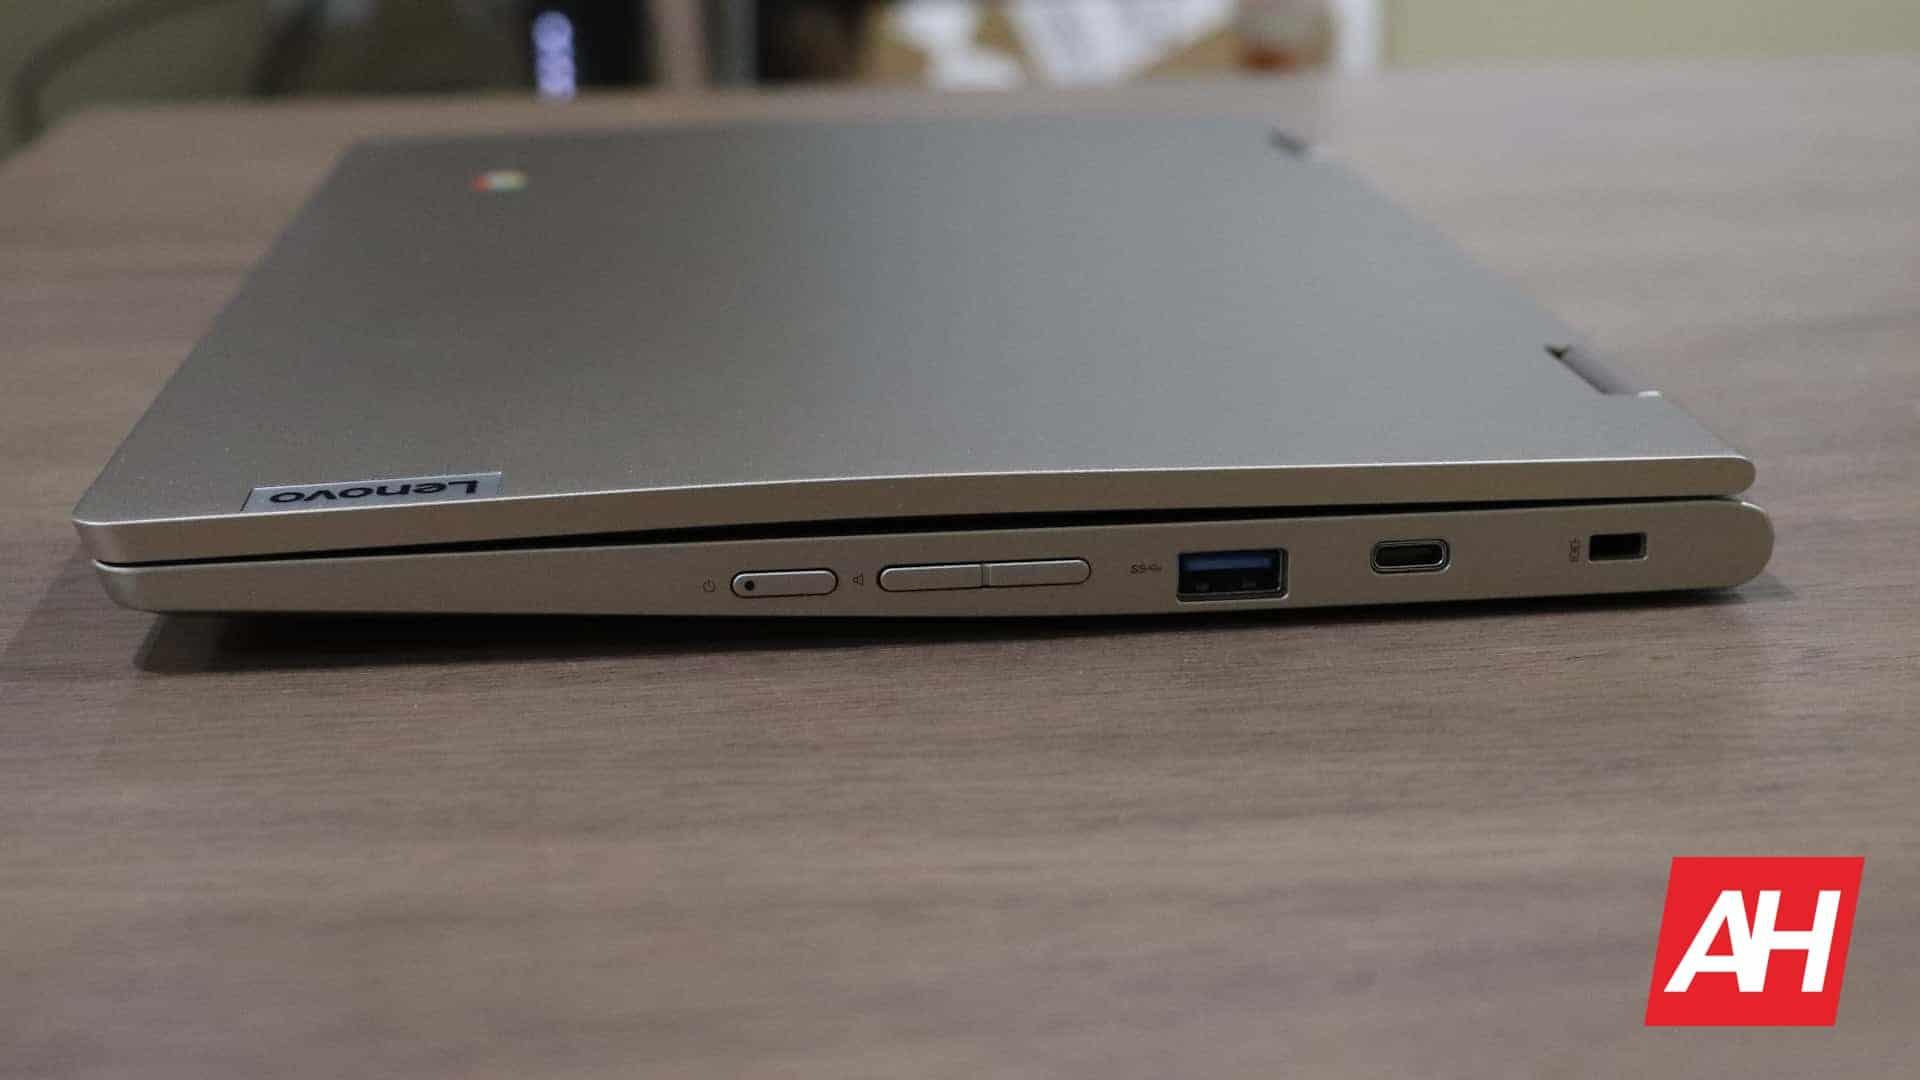 01 3 Lenovo IdeaPad Chromebook Flex 3 Review Hardware AH 2020